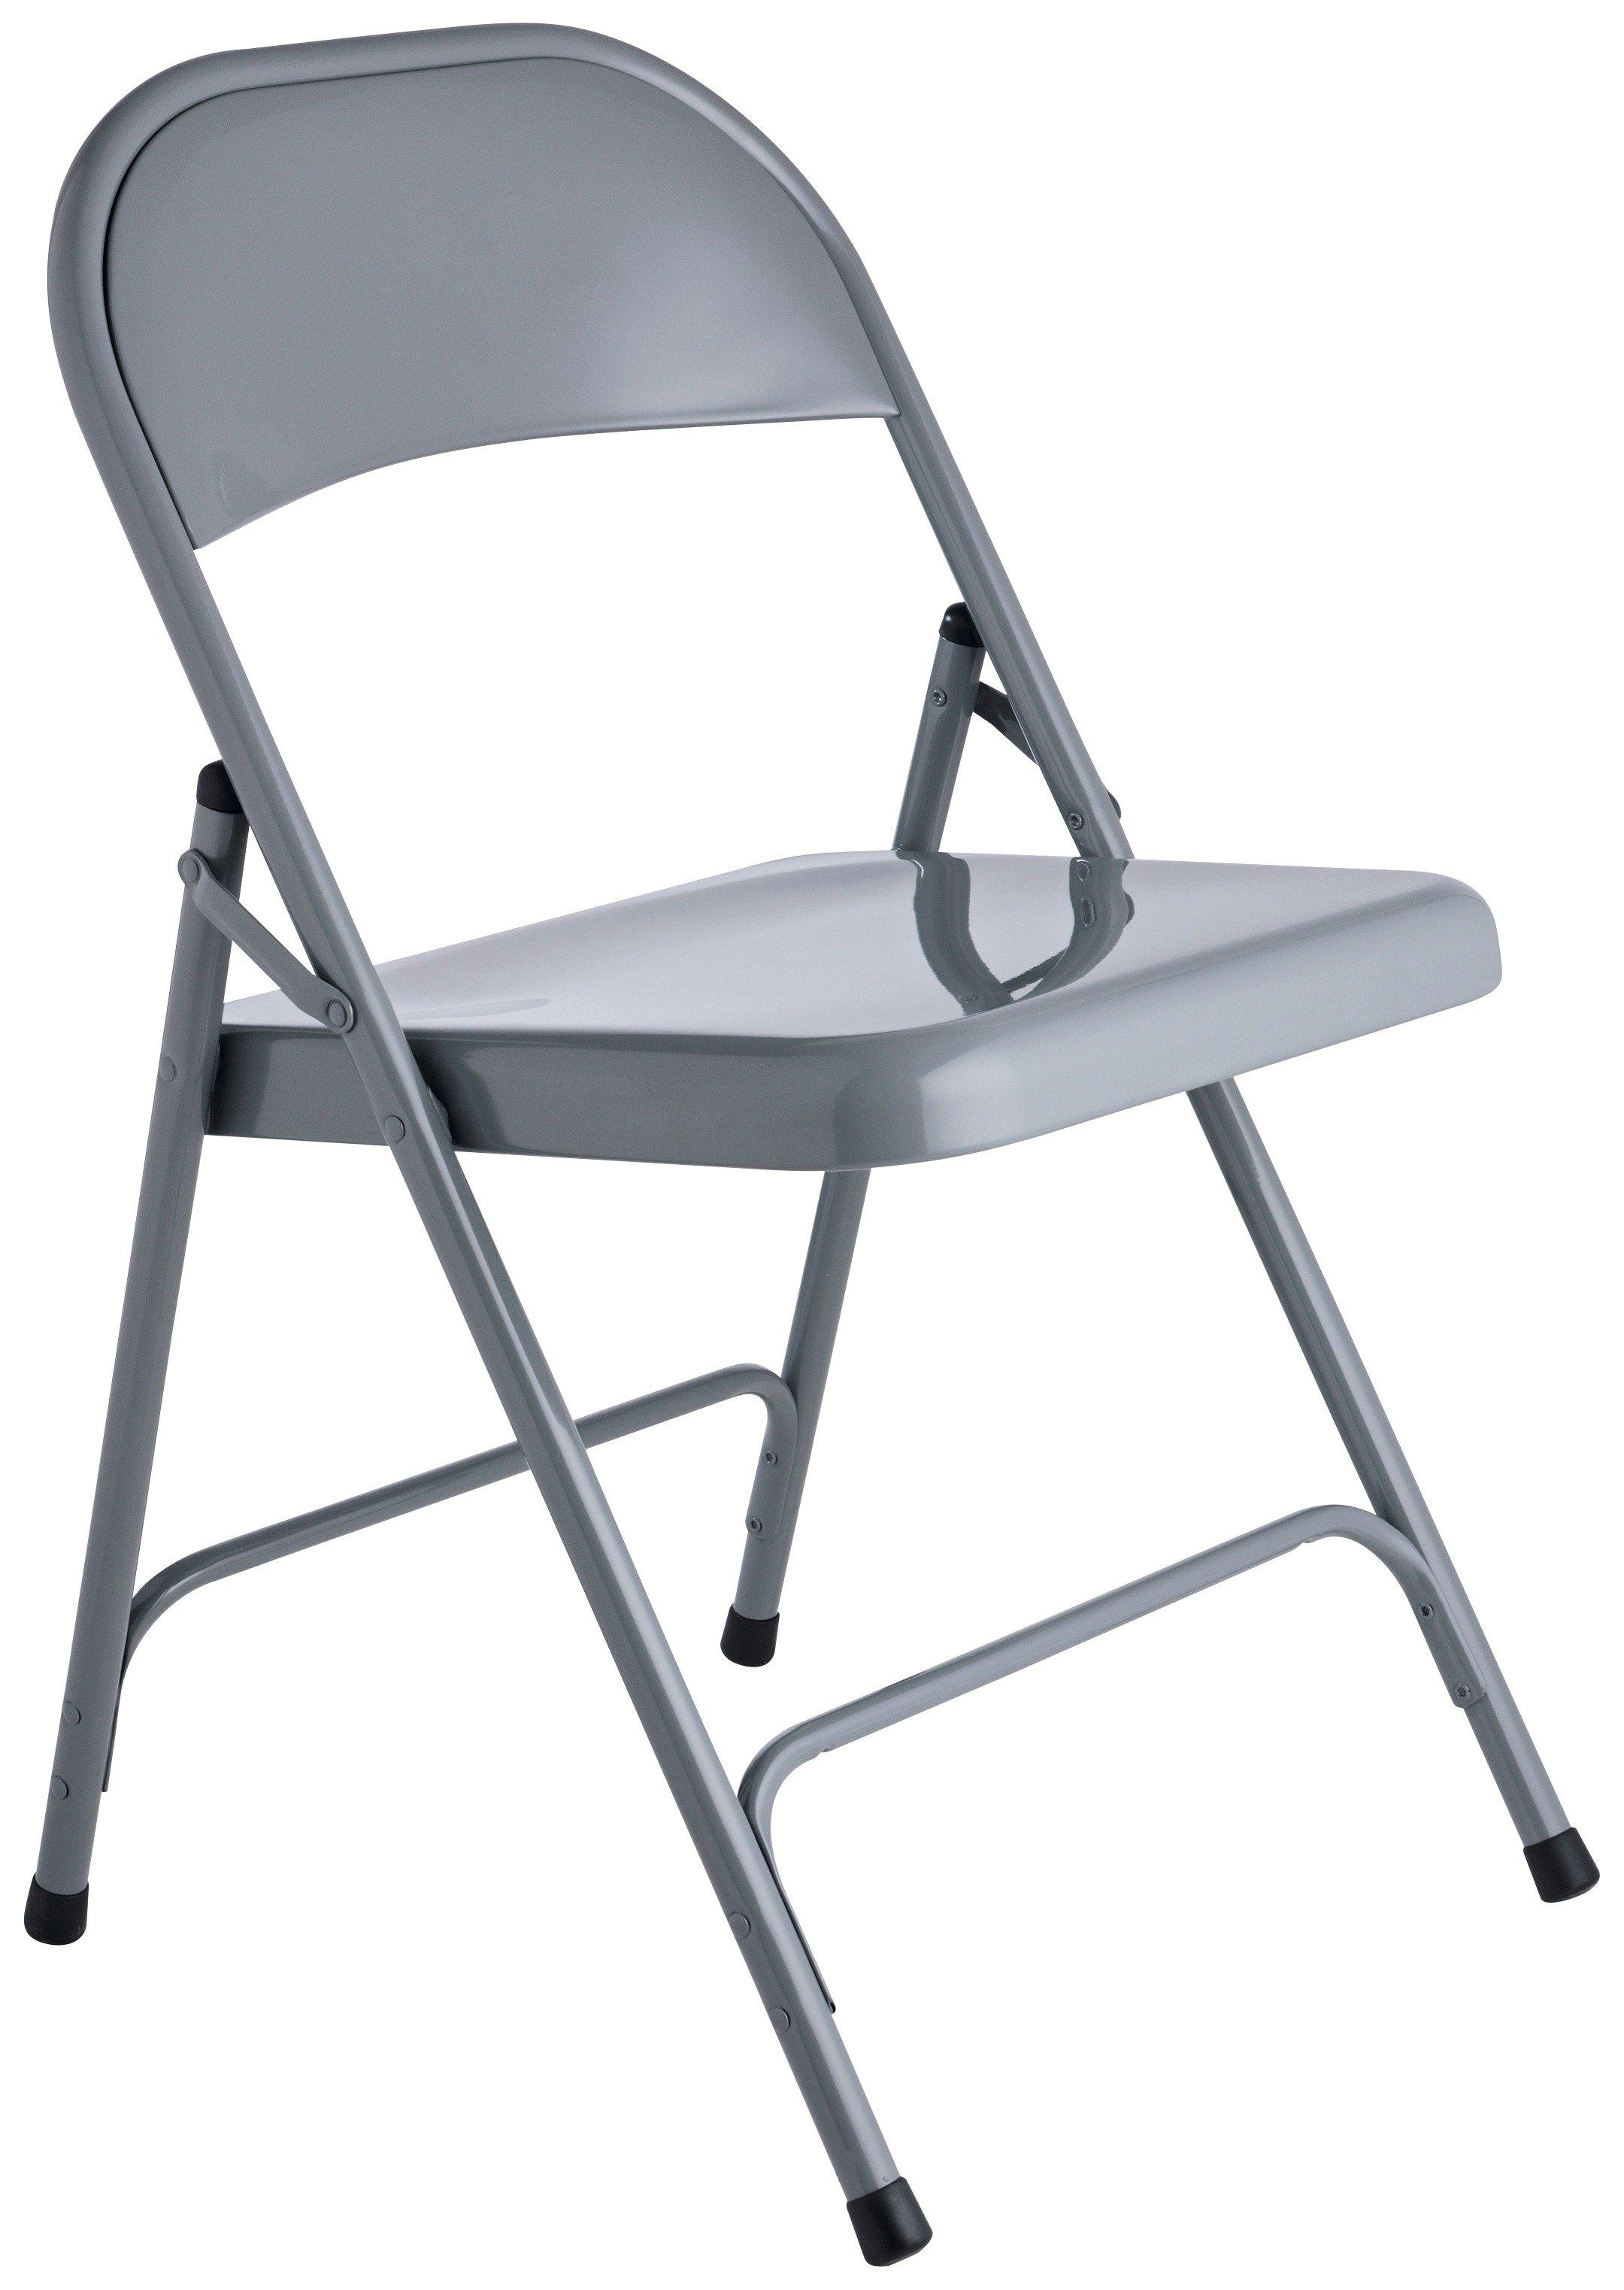 Habitat Macadam Metal Folding Chair   Grey184/6593